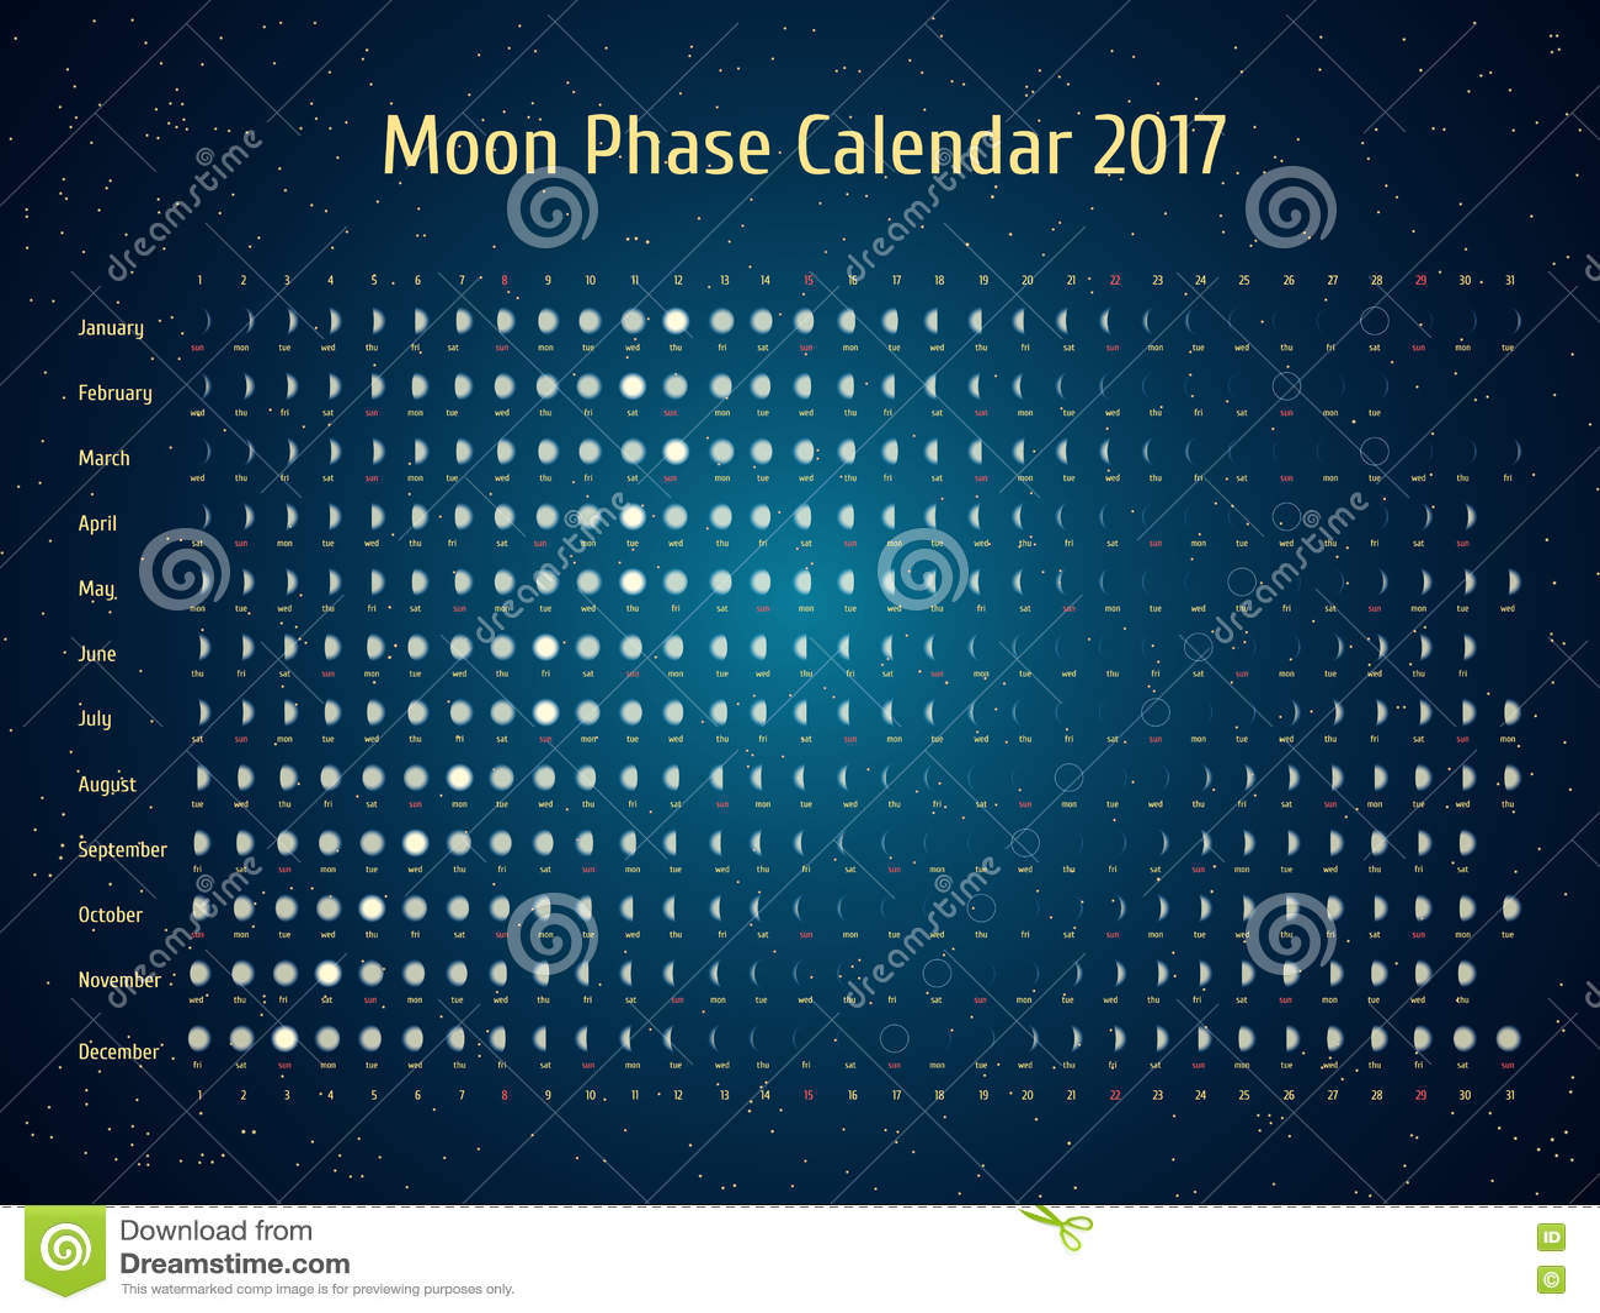 Vector Astrological Calendar For Moon Phase Calendar